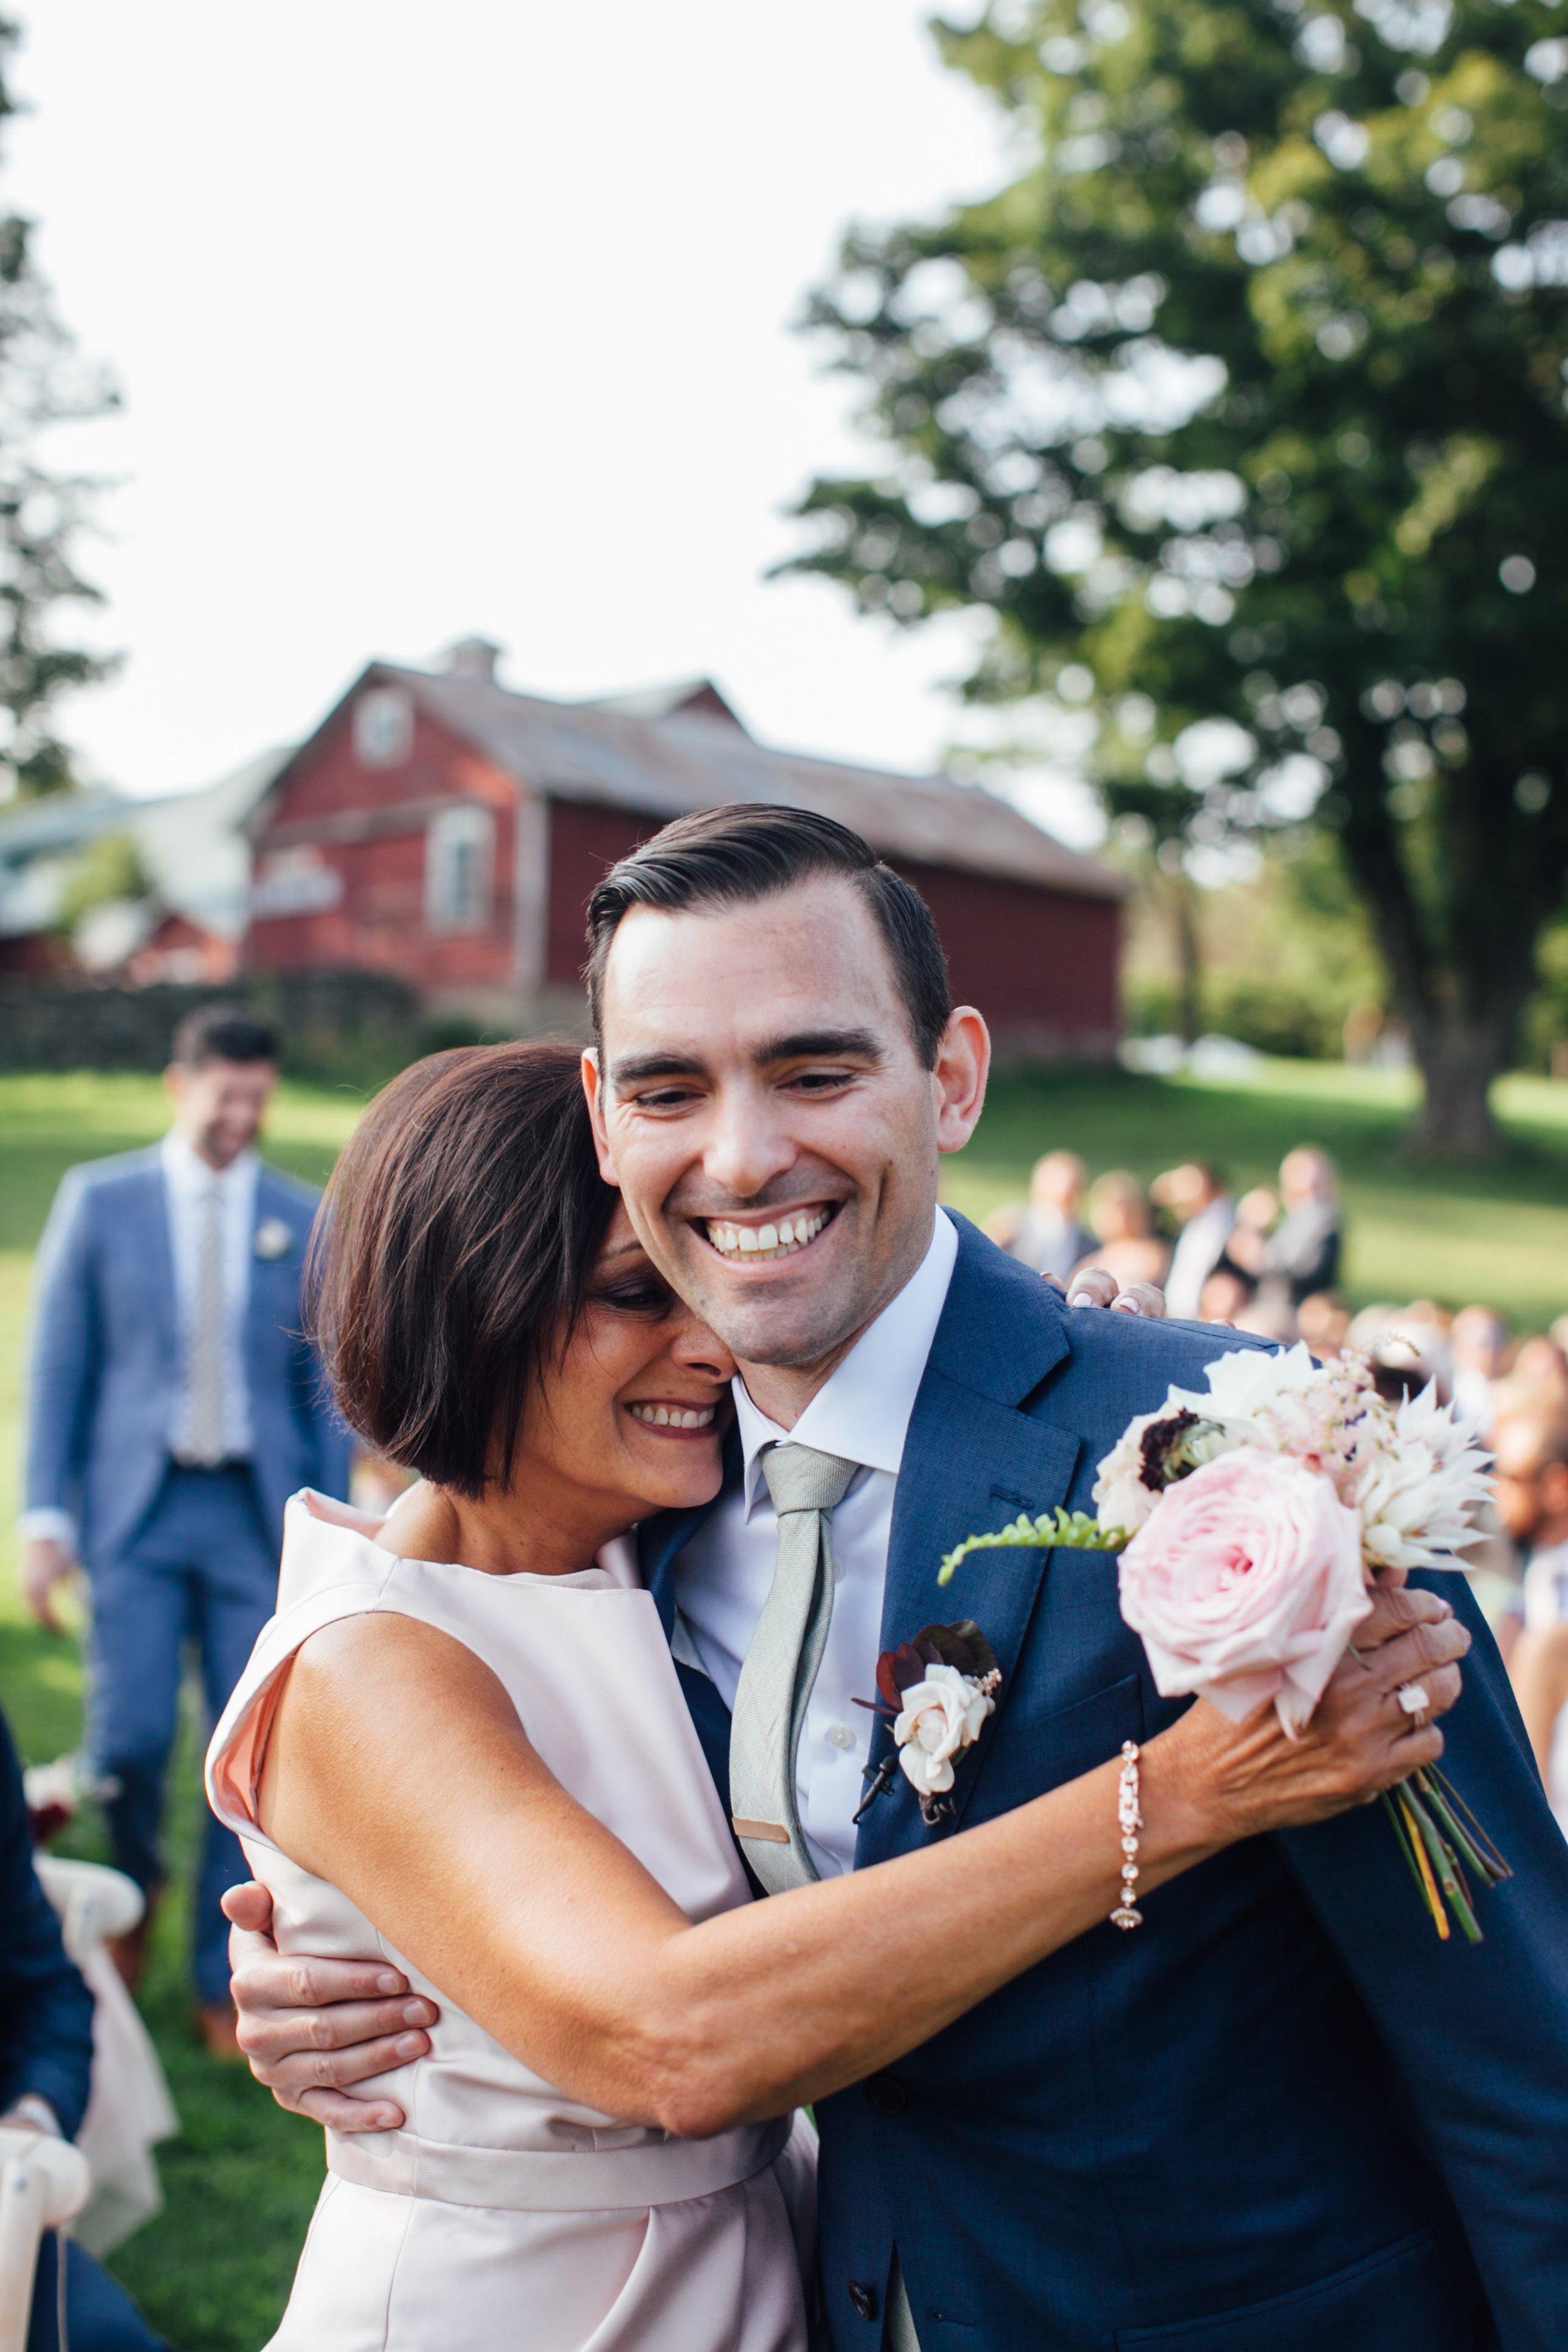 Courtney + Matt Blenheim Hill Farm Catskills NY Wedding Veronica Lola Photography 2017-354.jpg